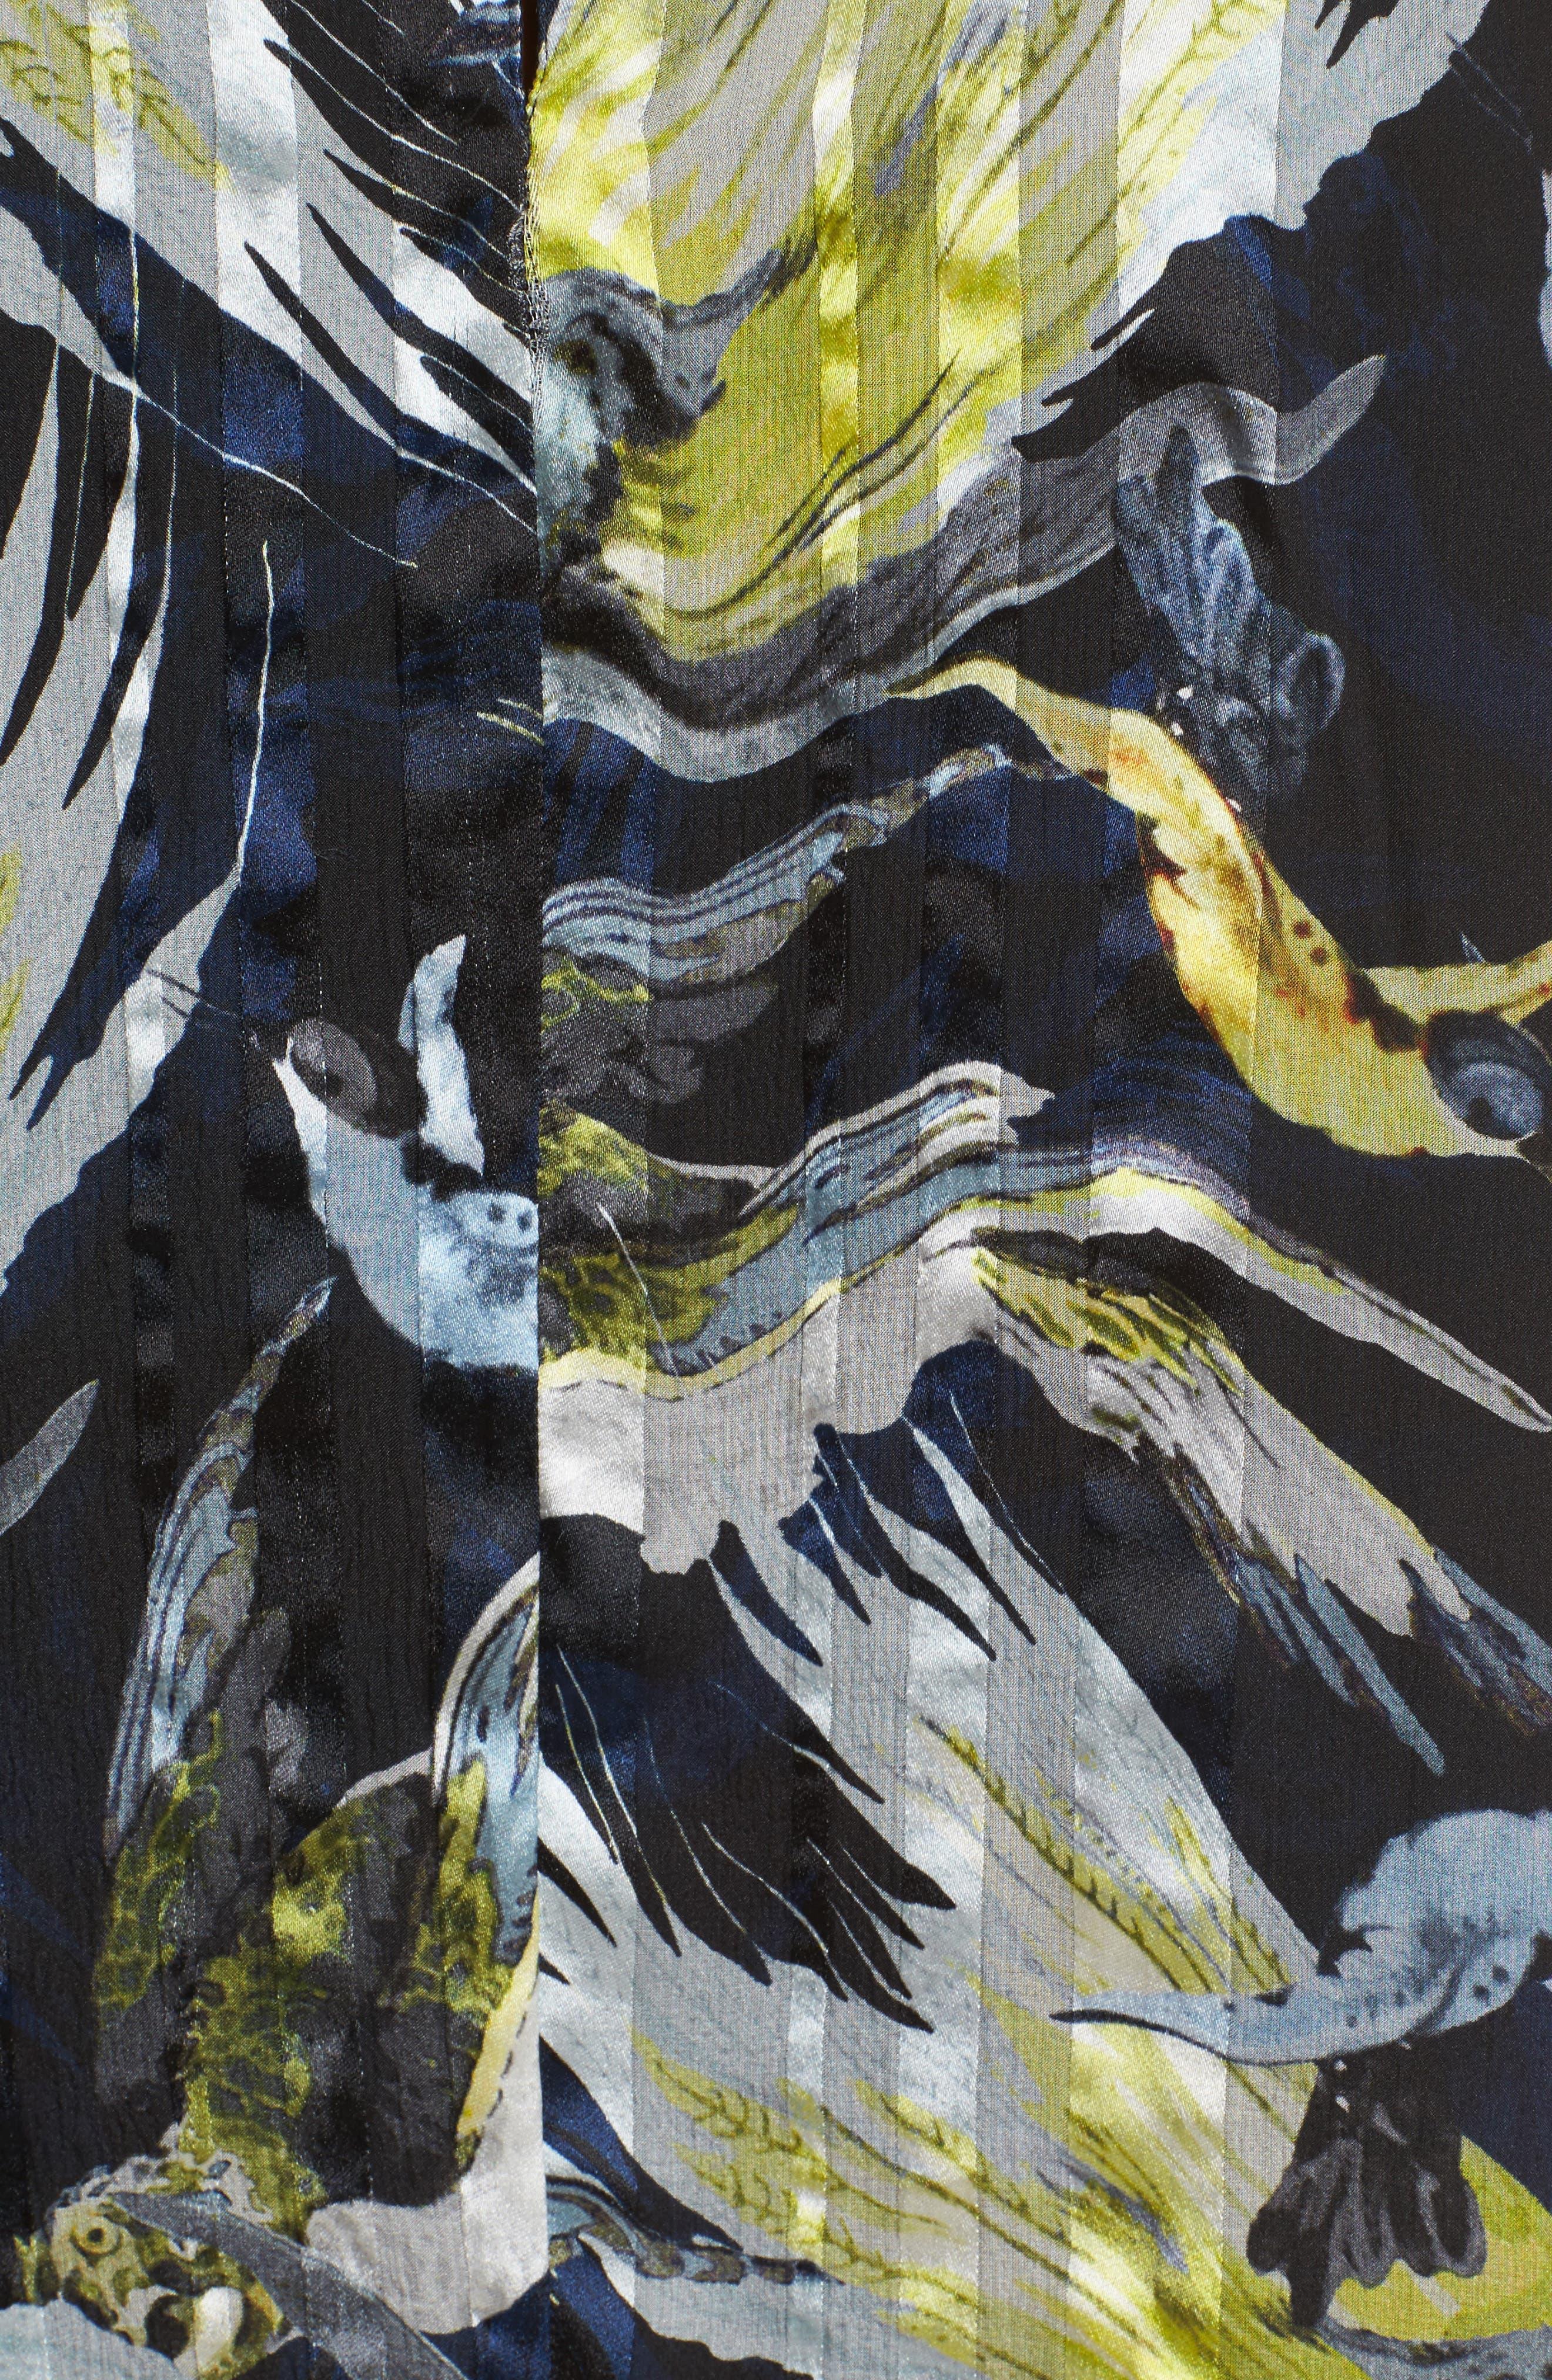 Bird Print Silk Chiffon Blouse,                             Alternate thumbnail 3, color,                             Black/ Yellow